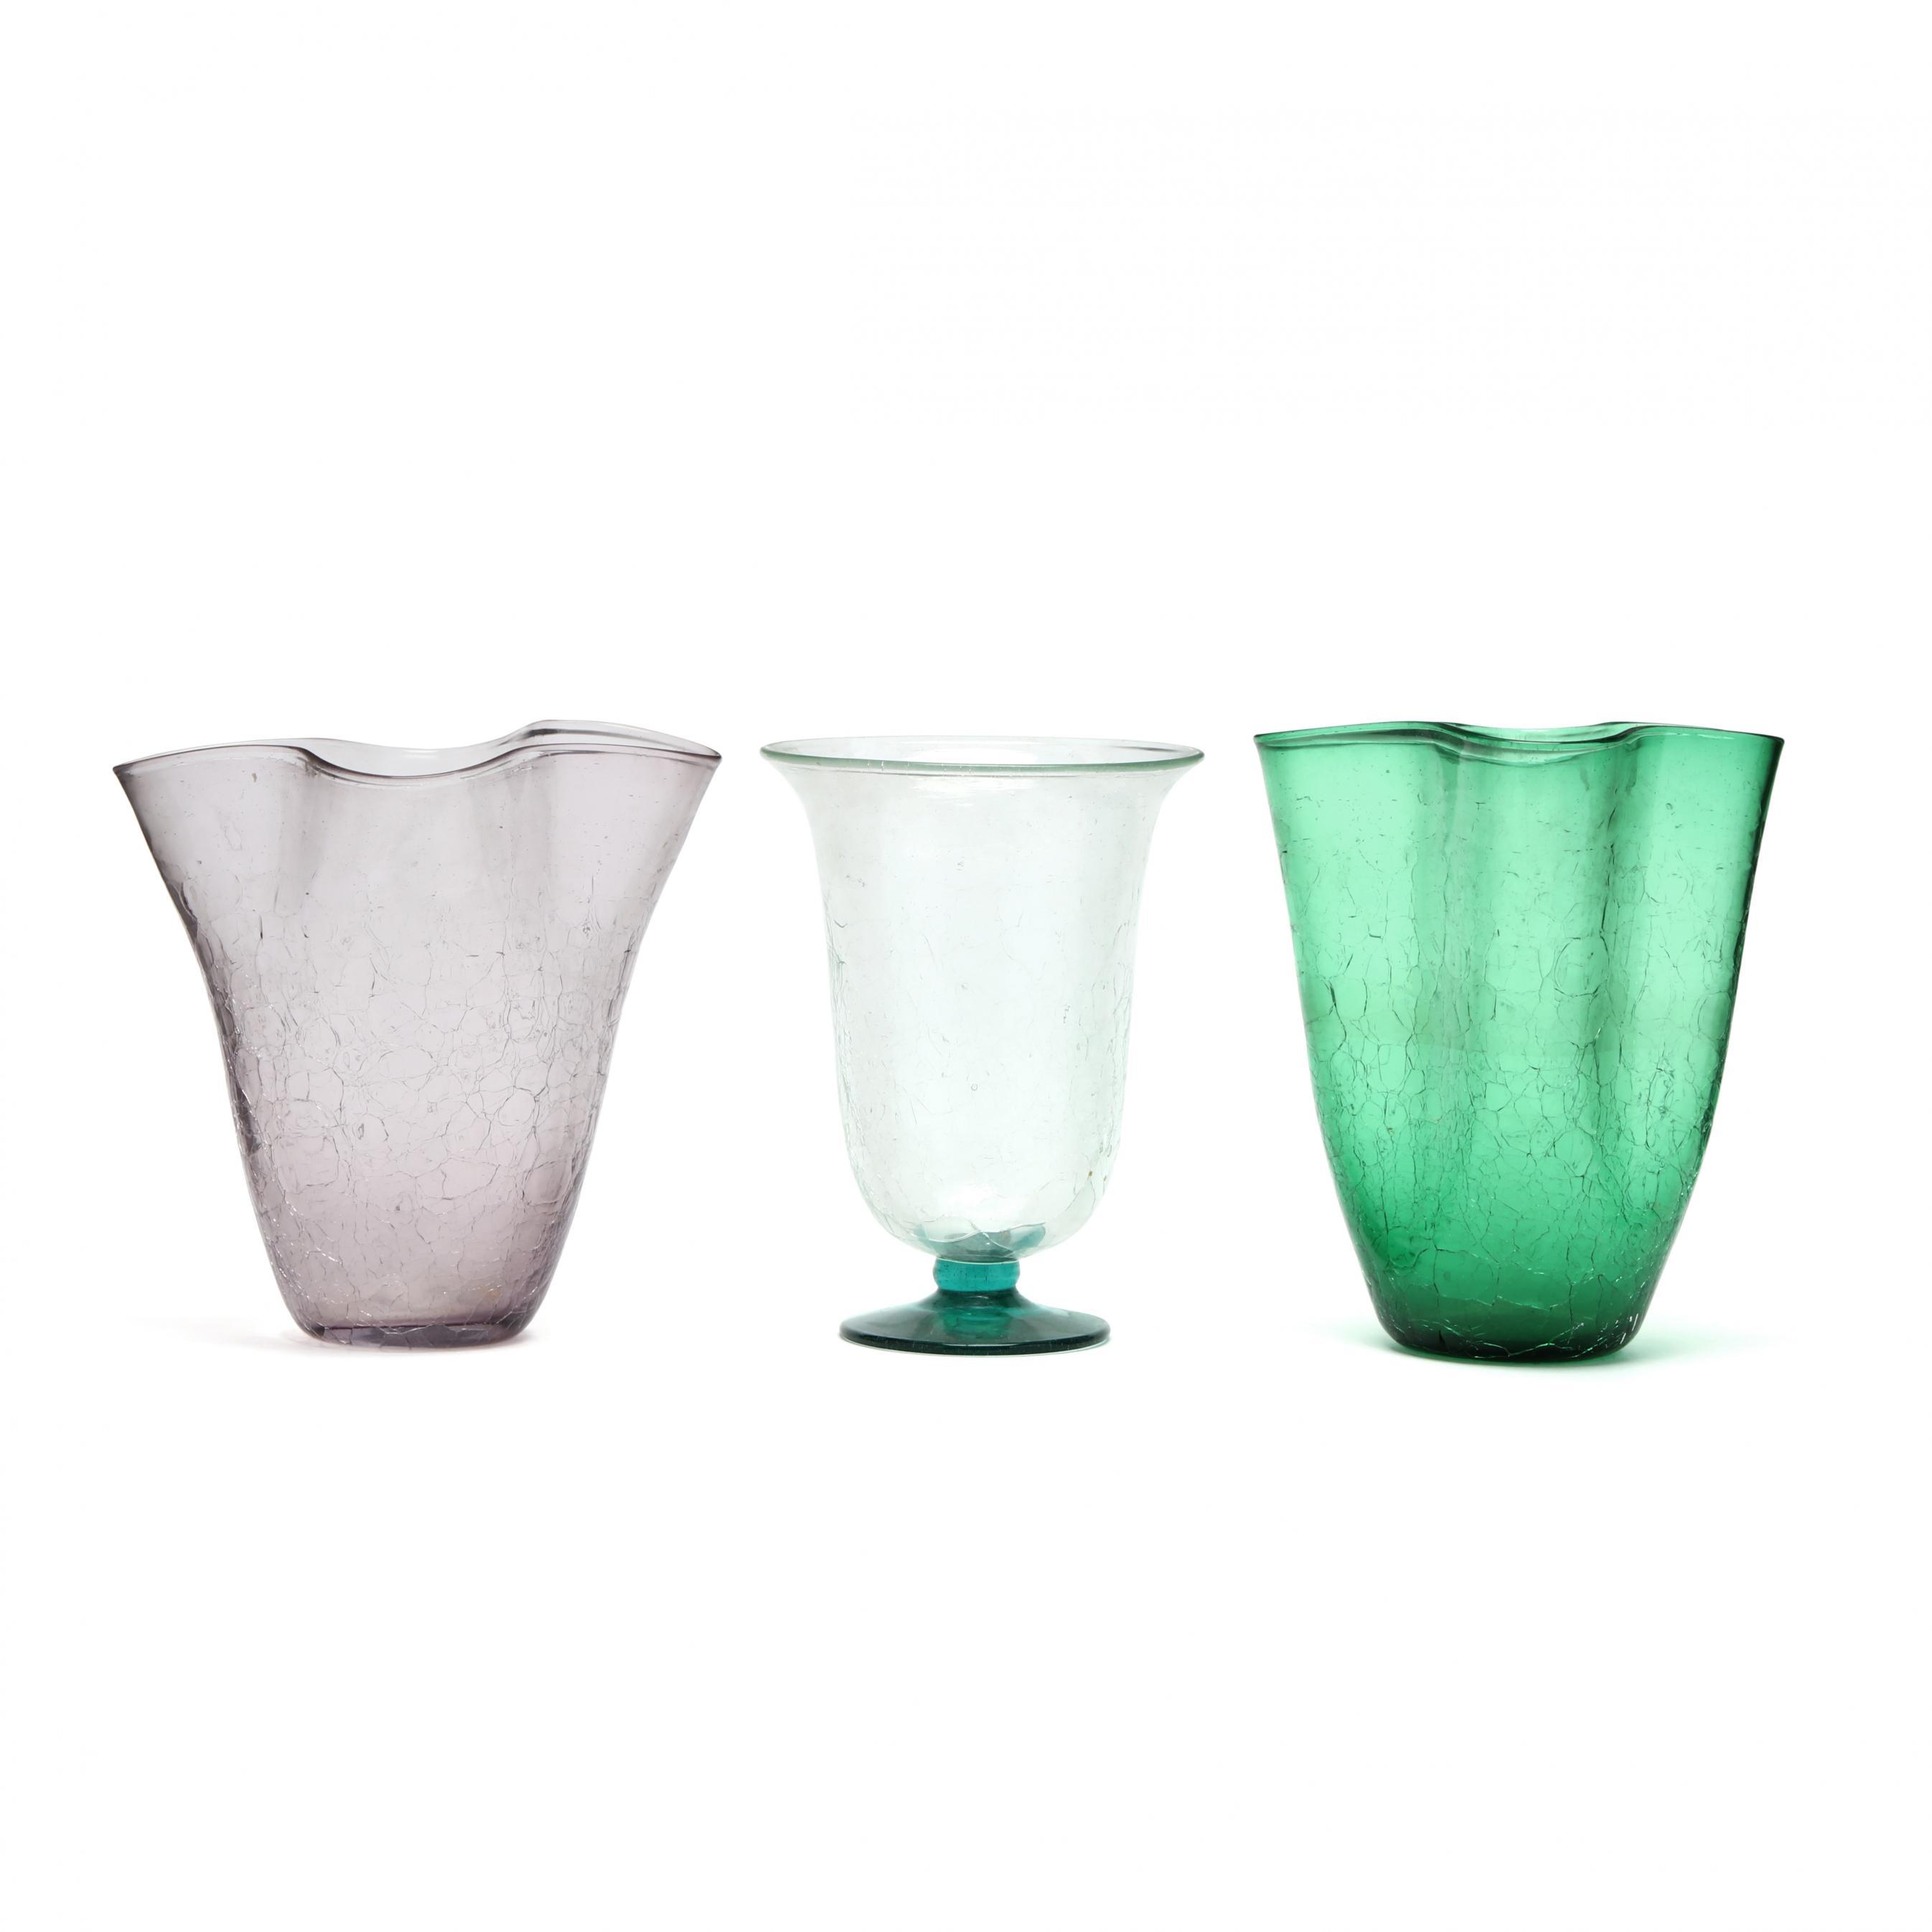 blenko-three-crackle-glass-vases